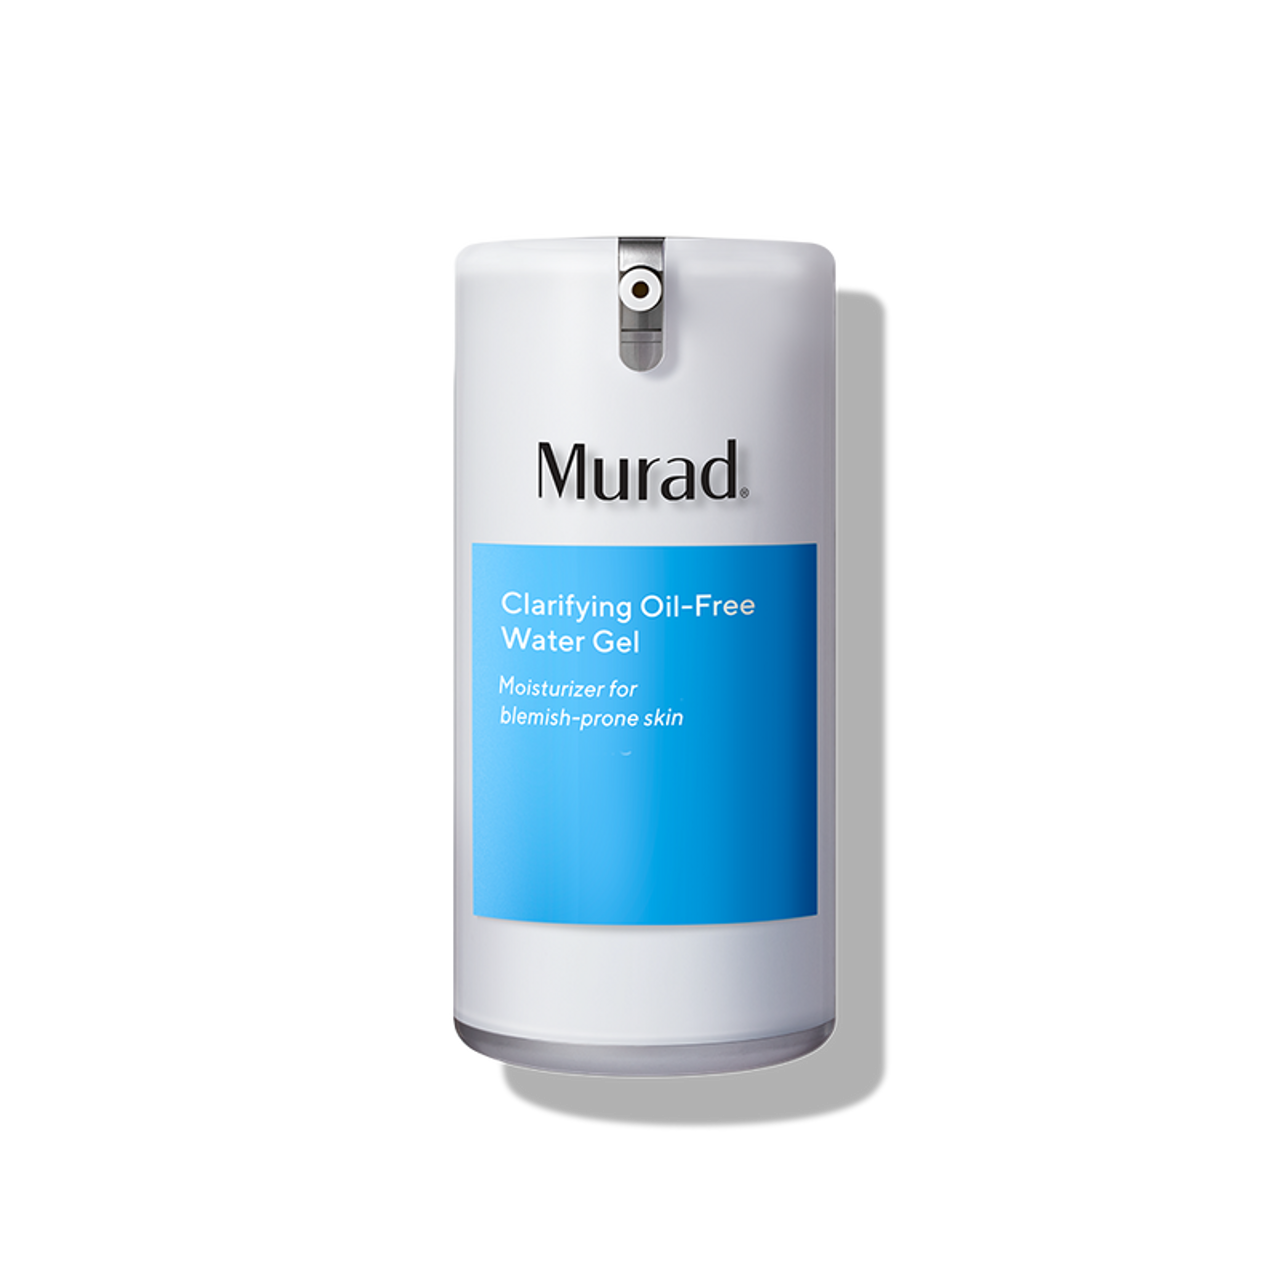 Murad Clarifying Oil-Free Water Gel 1.6 oz (